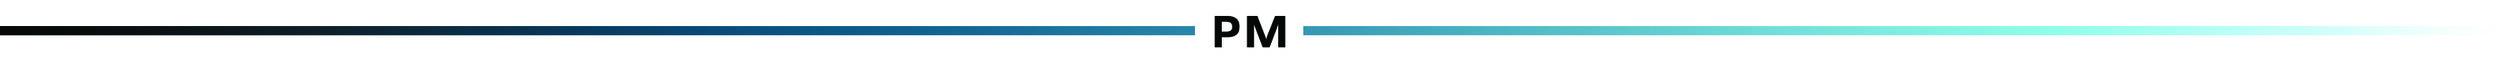 PM line.jpg